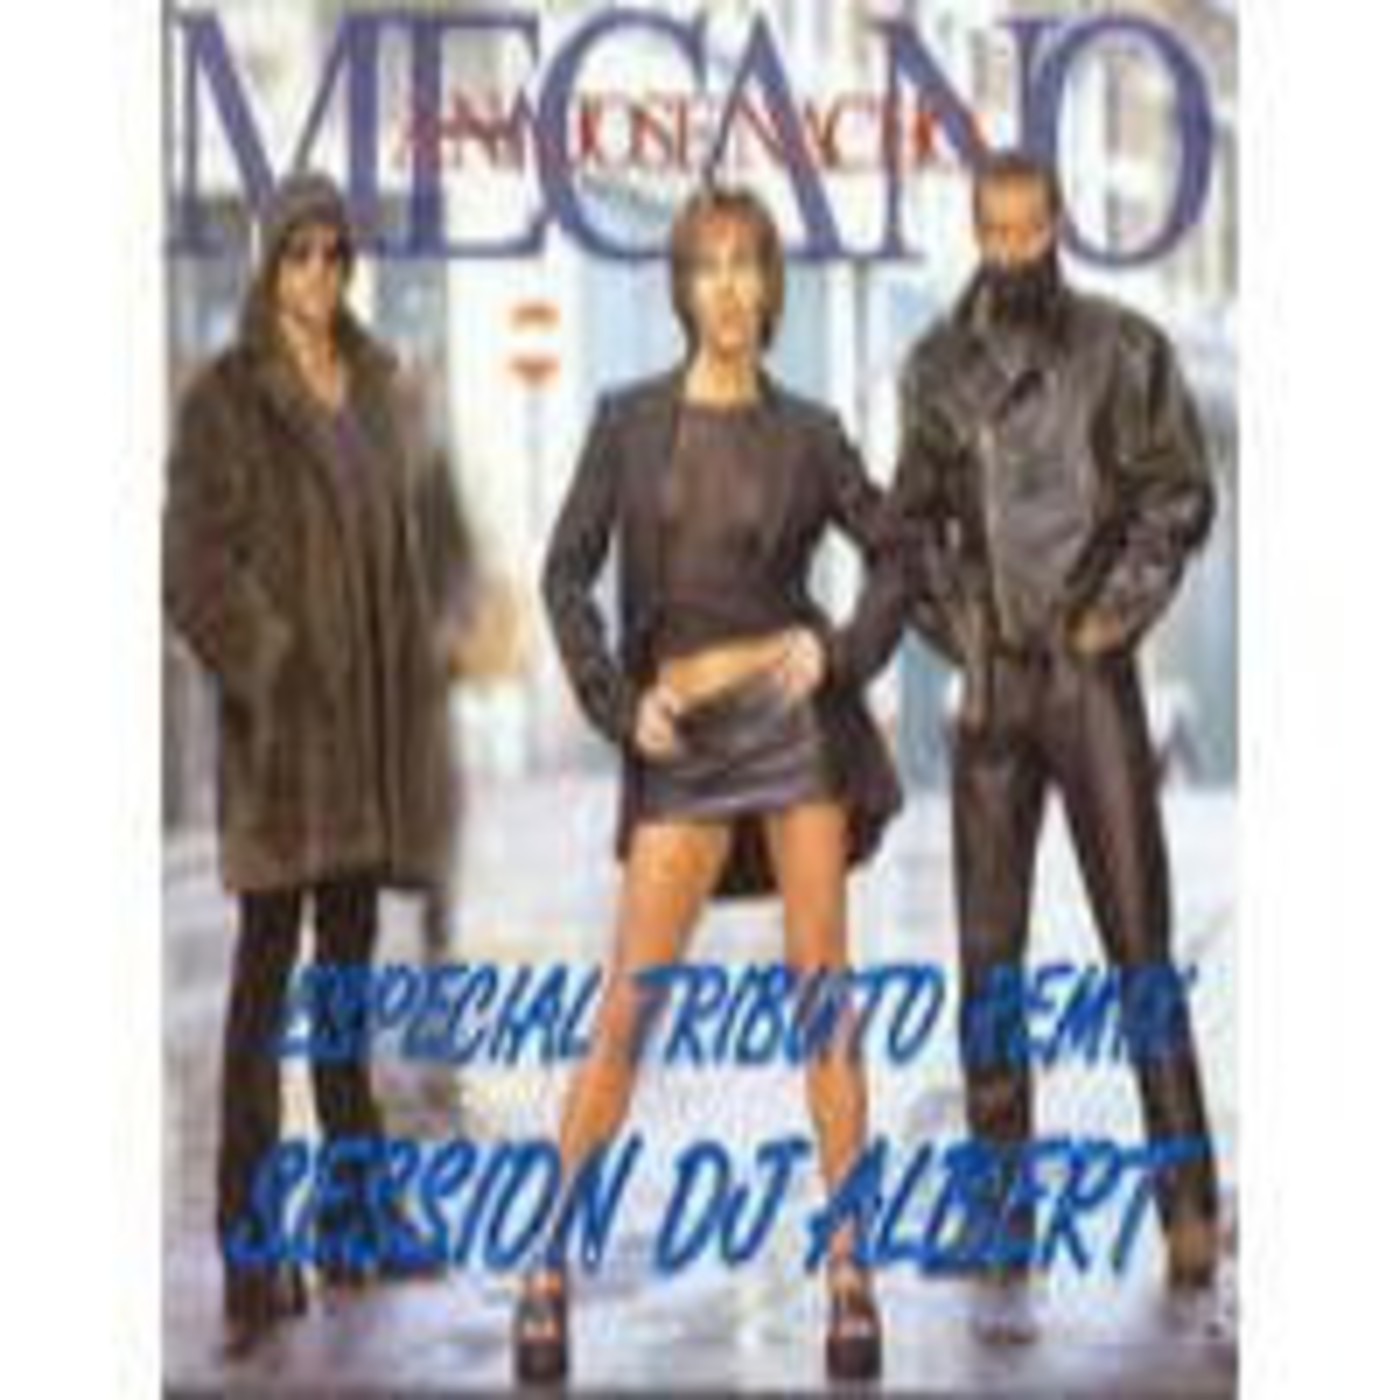 MECANO Especial Tributo Remix Session DJ Albert